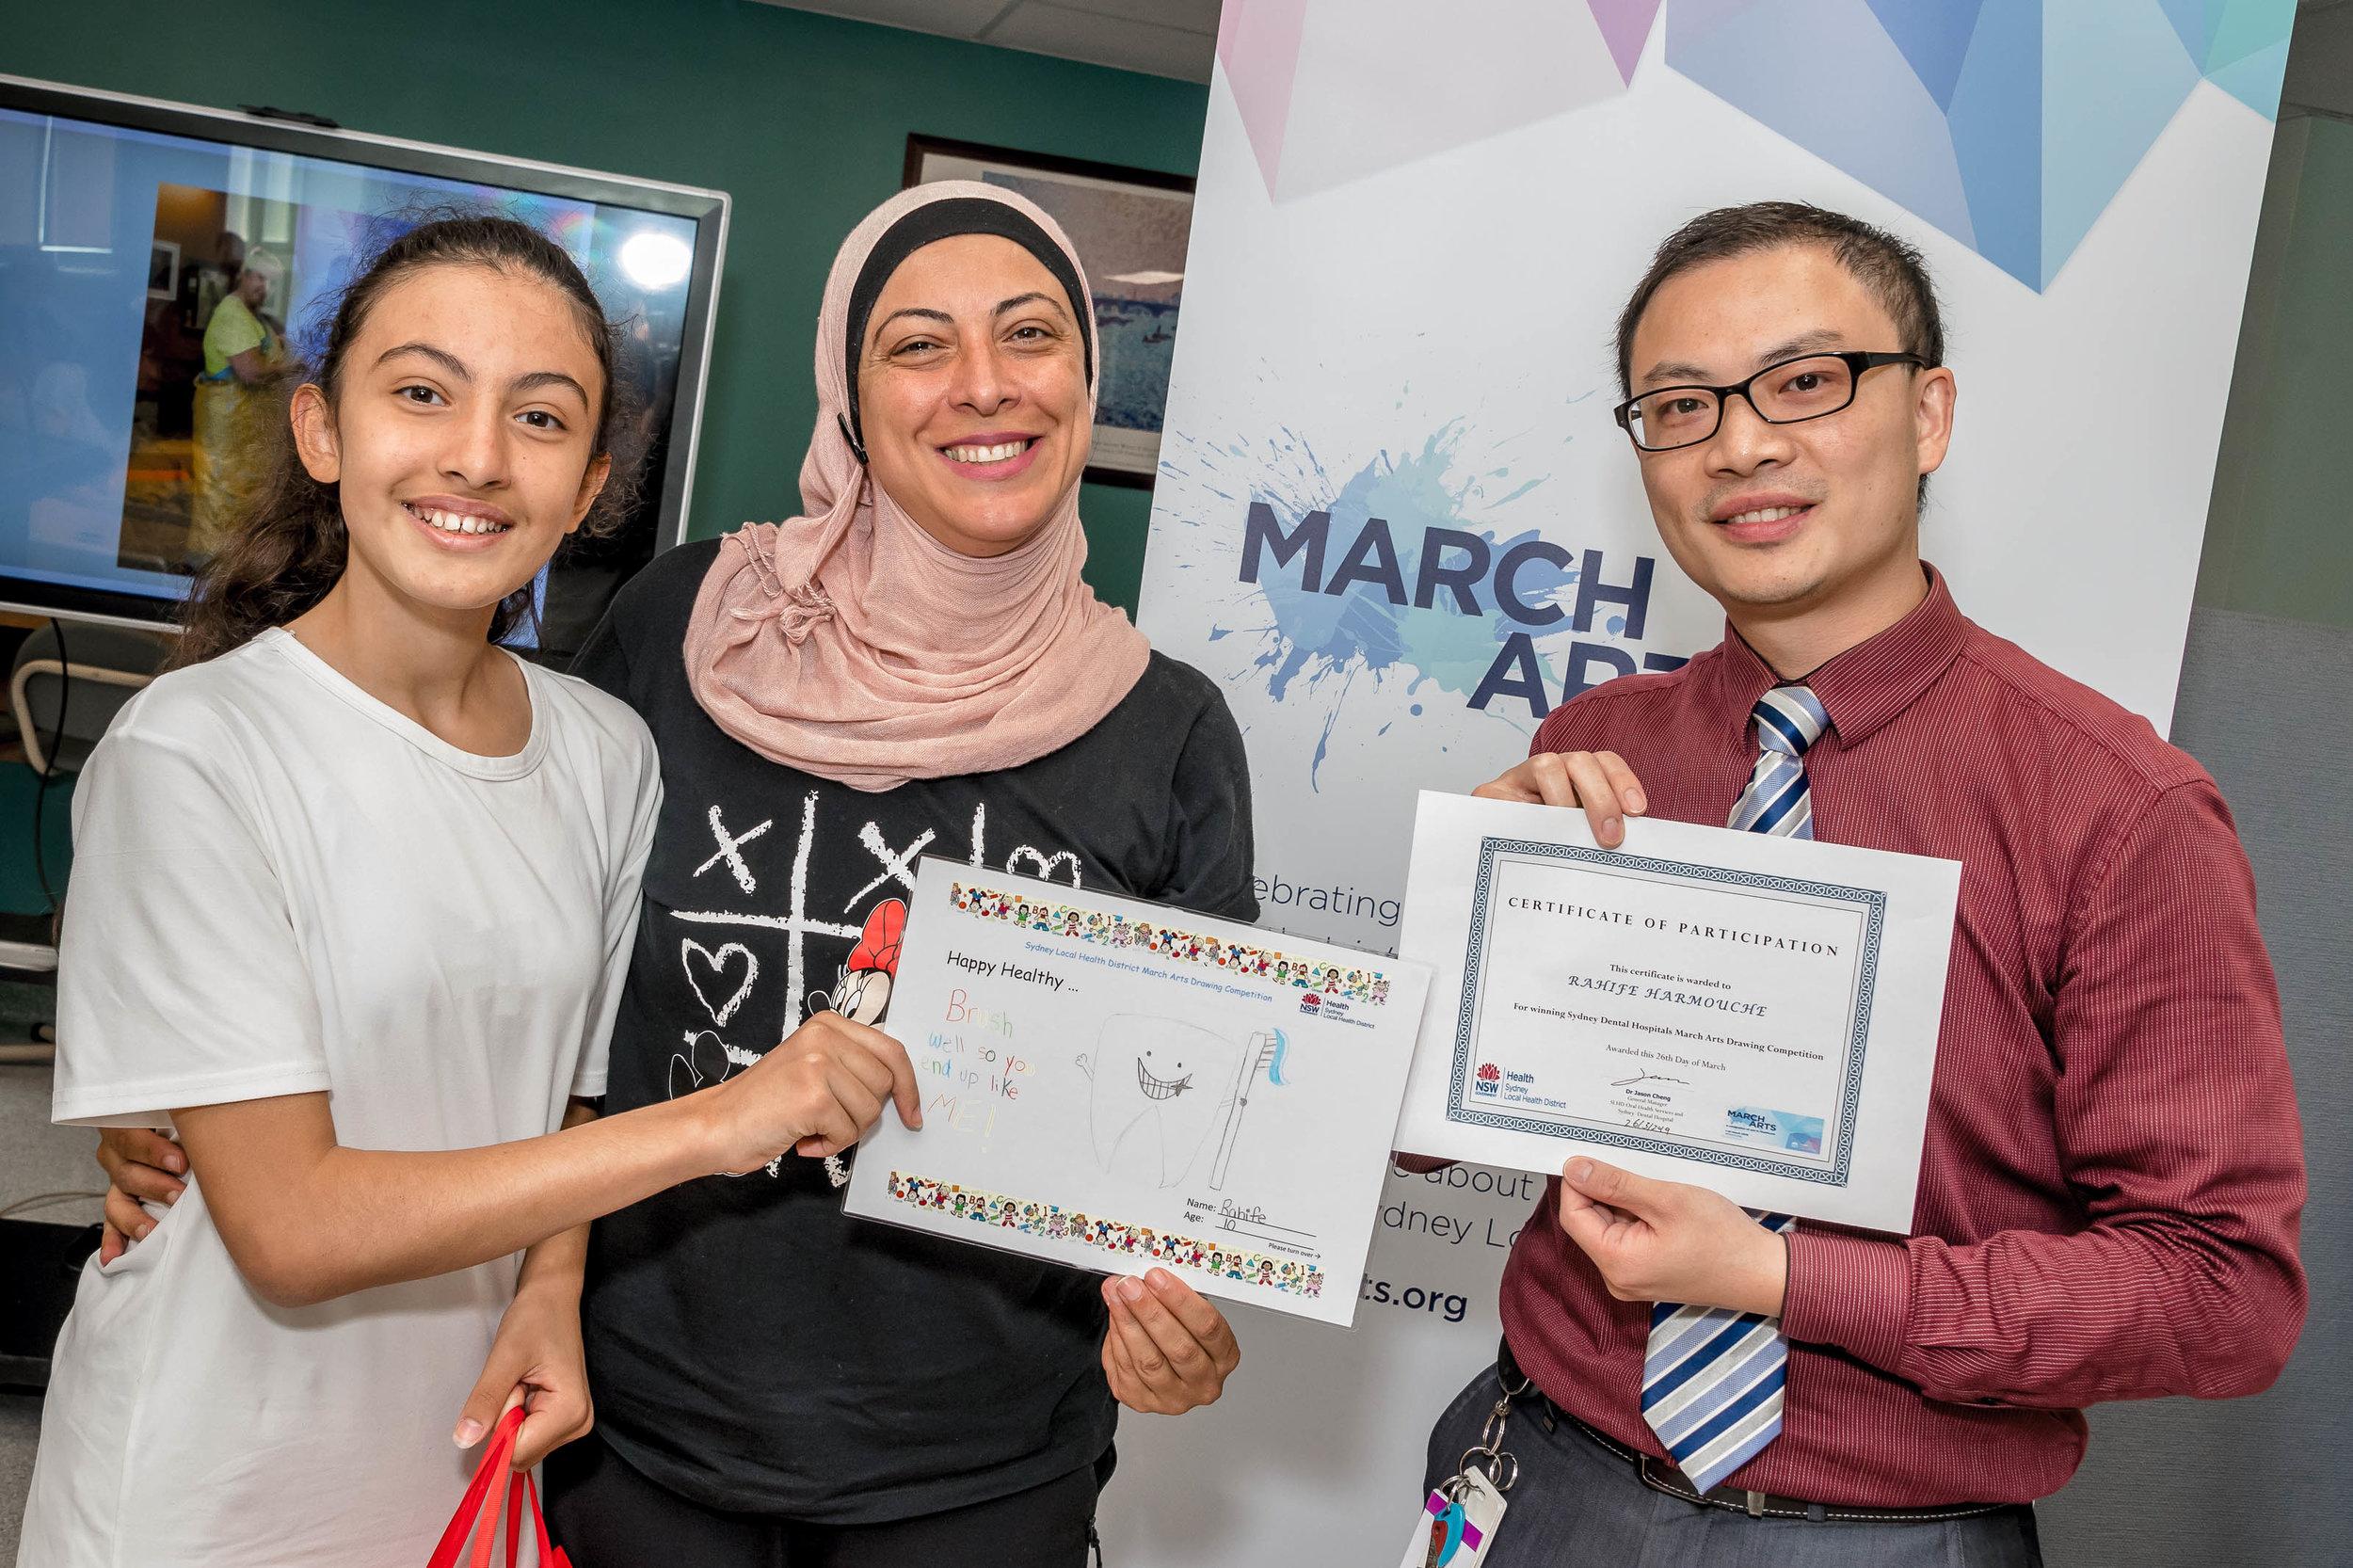 86365 March Arts Sydney Dental Hosp Colour Competition 20190326 WS2-231863.jpg